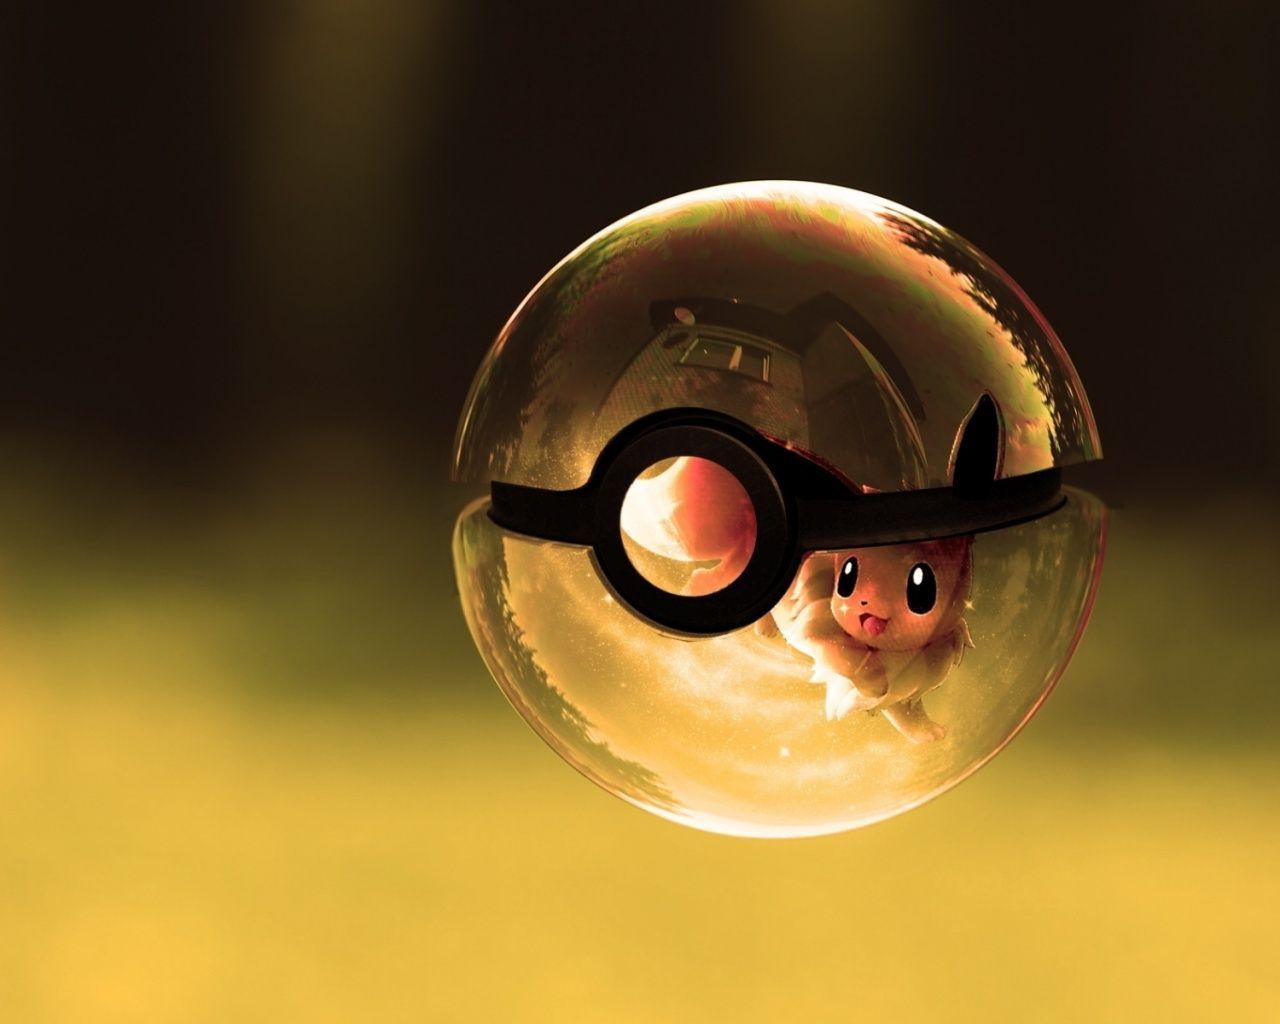 pin by sam meena on pokemon pinterest pokémon